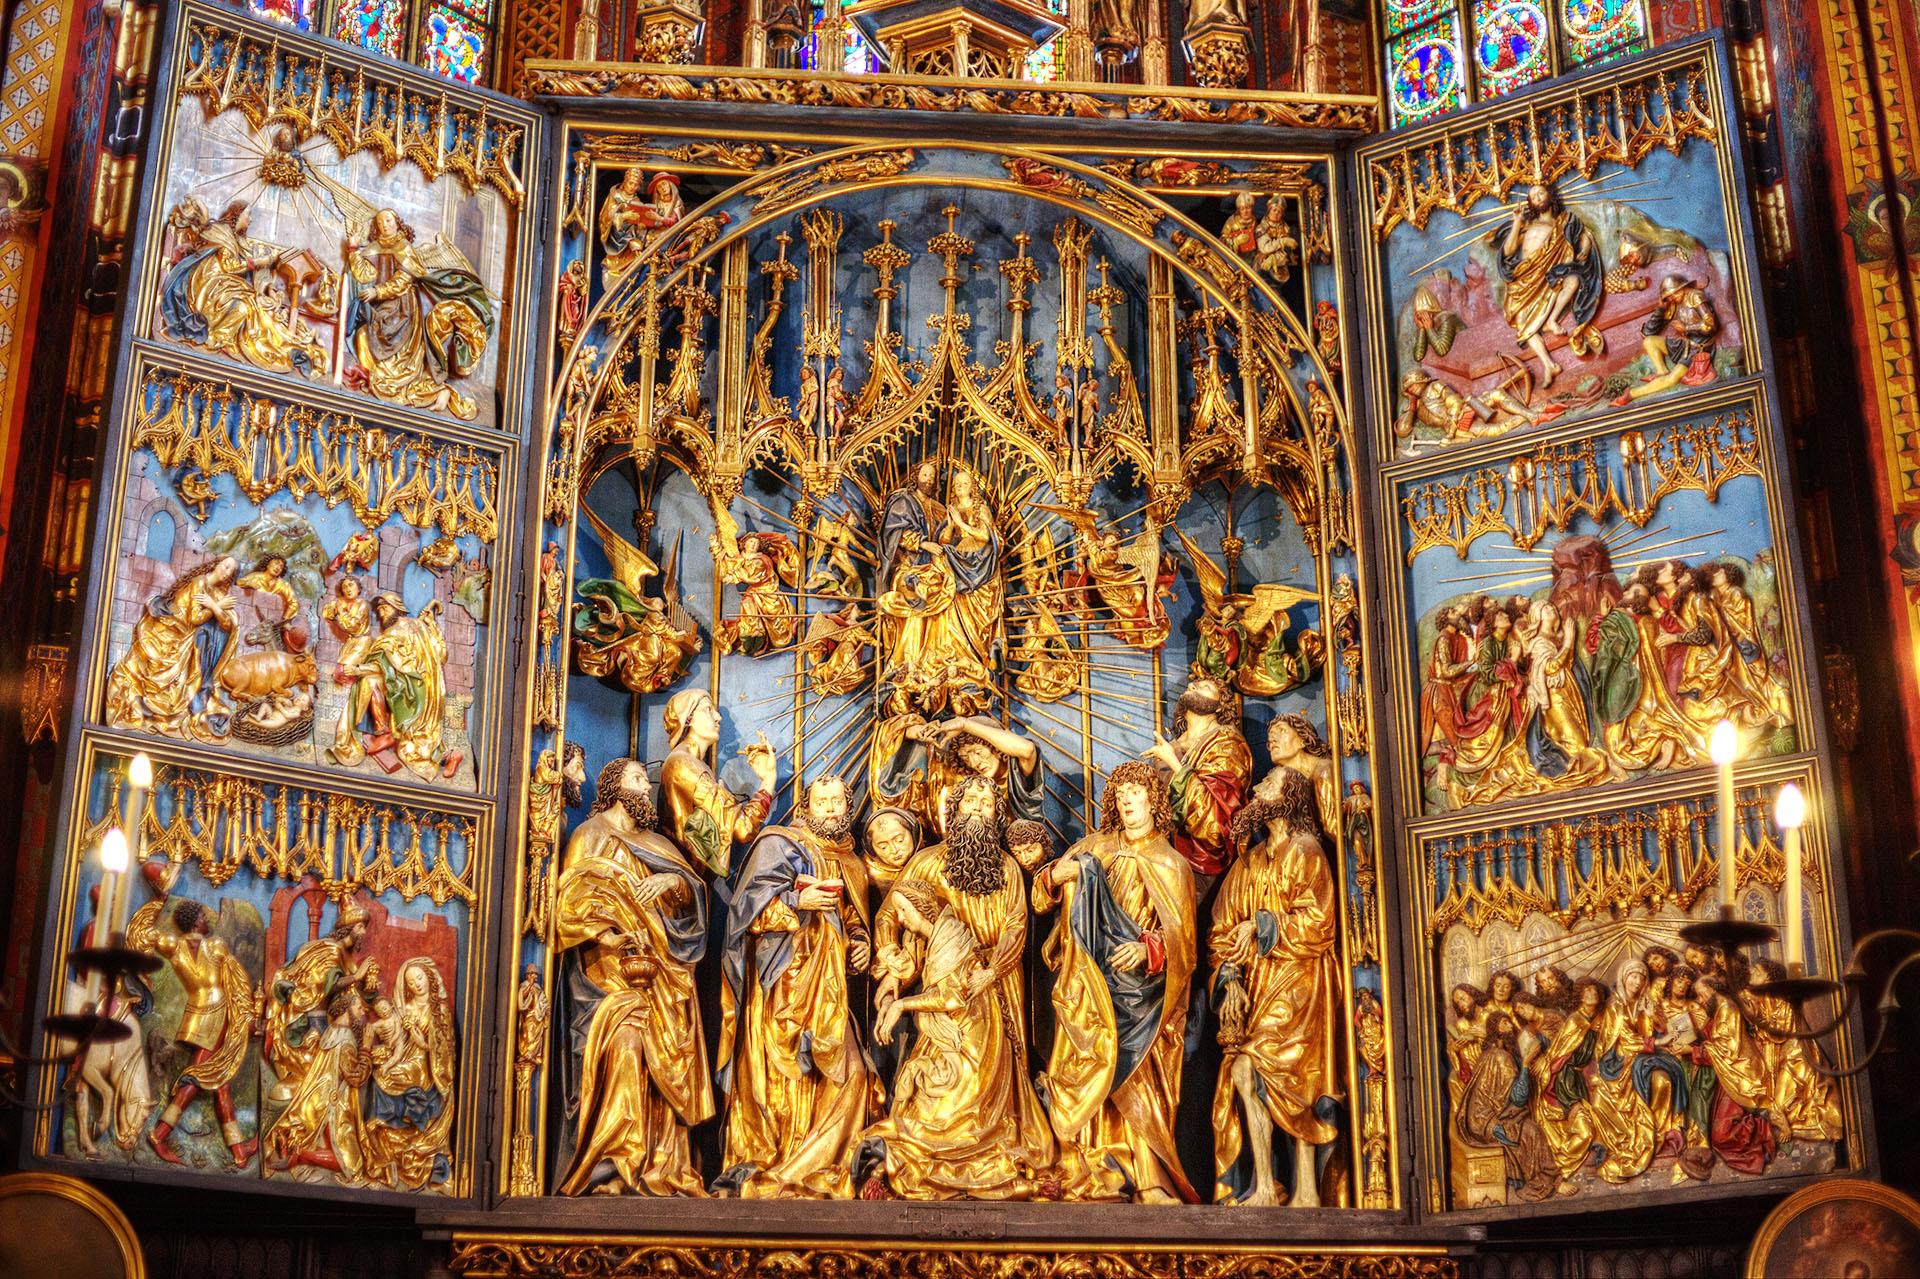 Inside St. Mary's Basilica, Krakow.